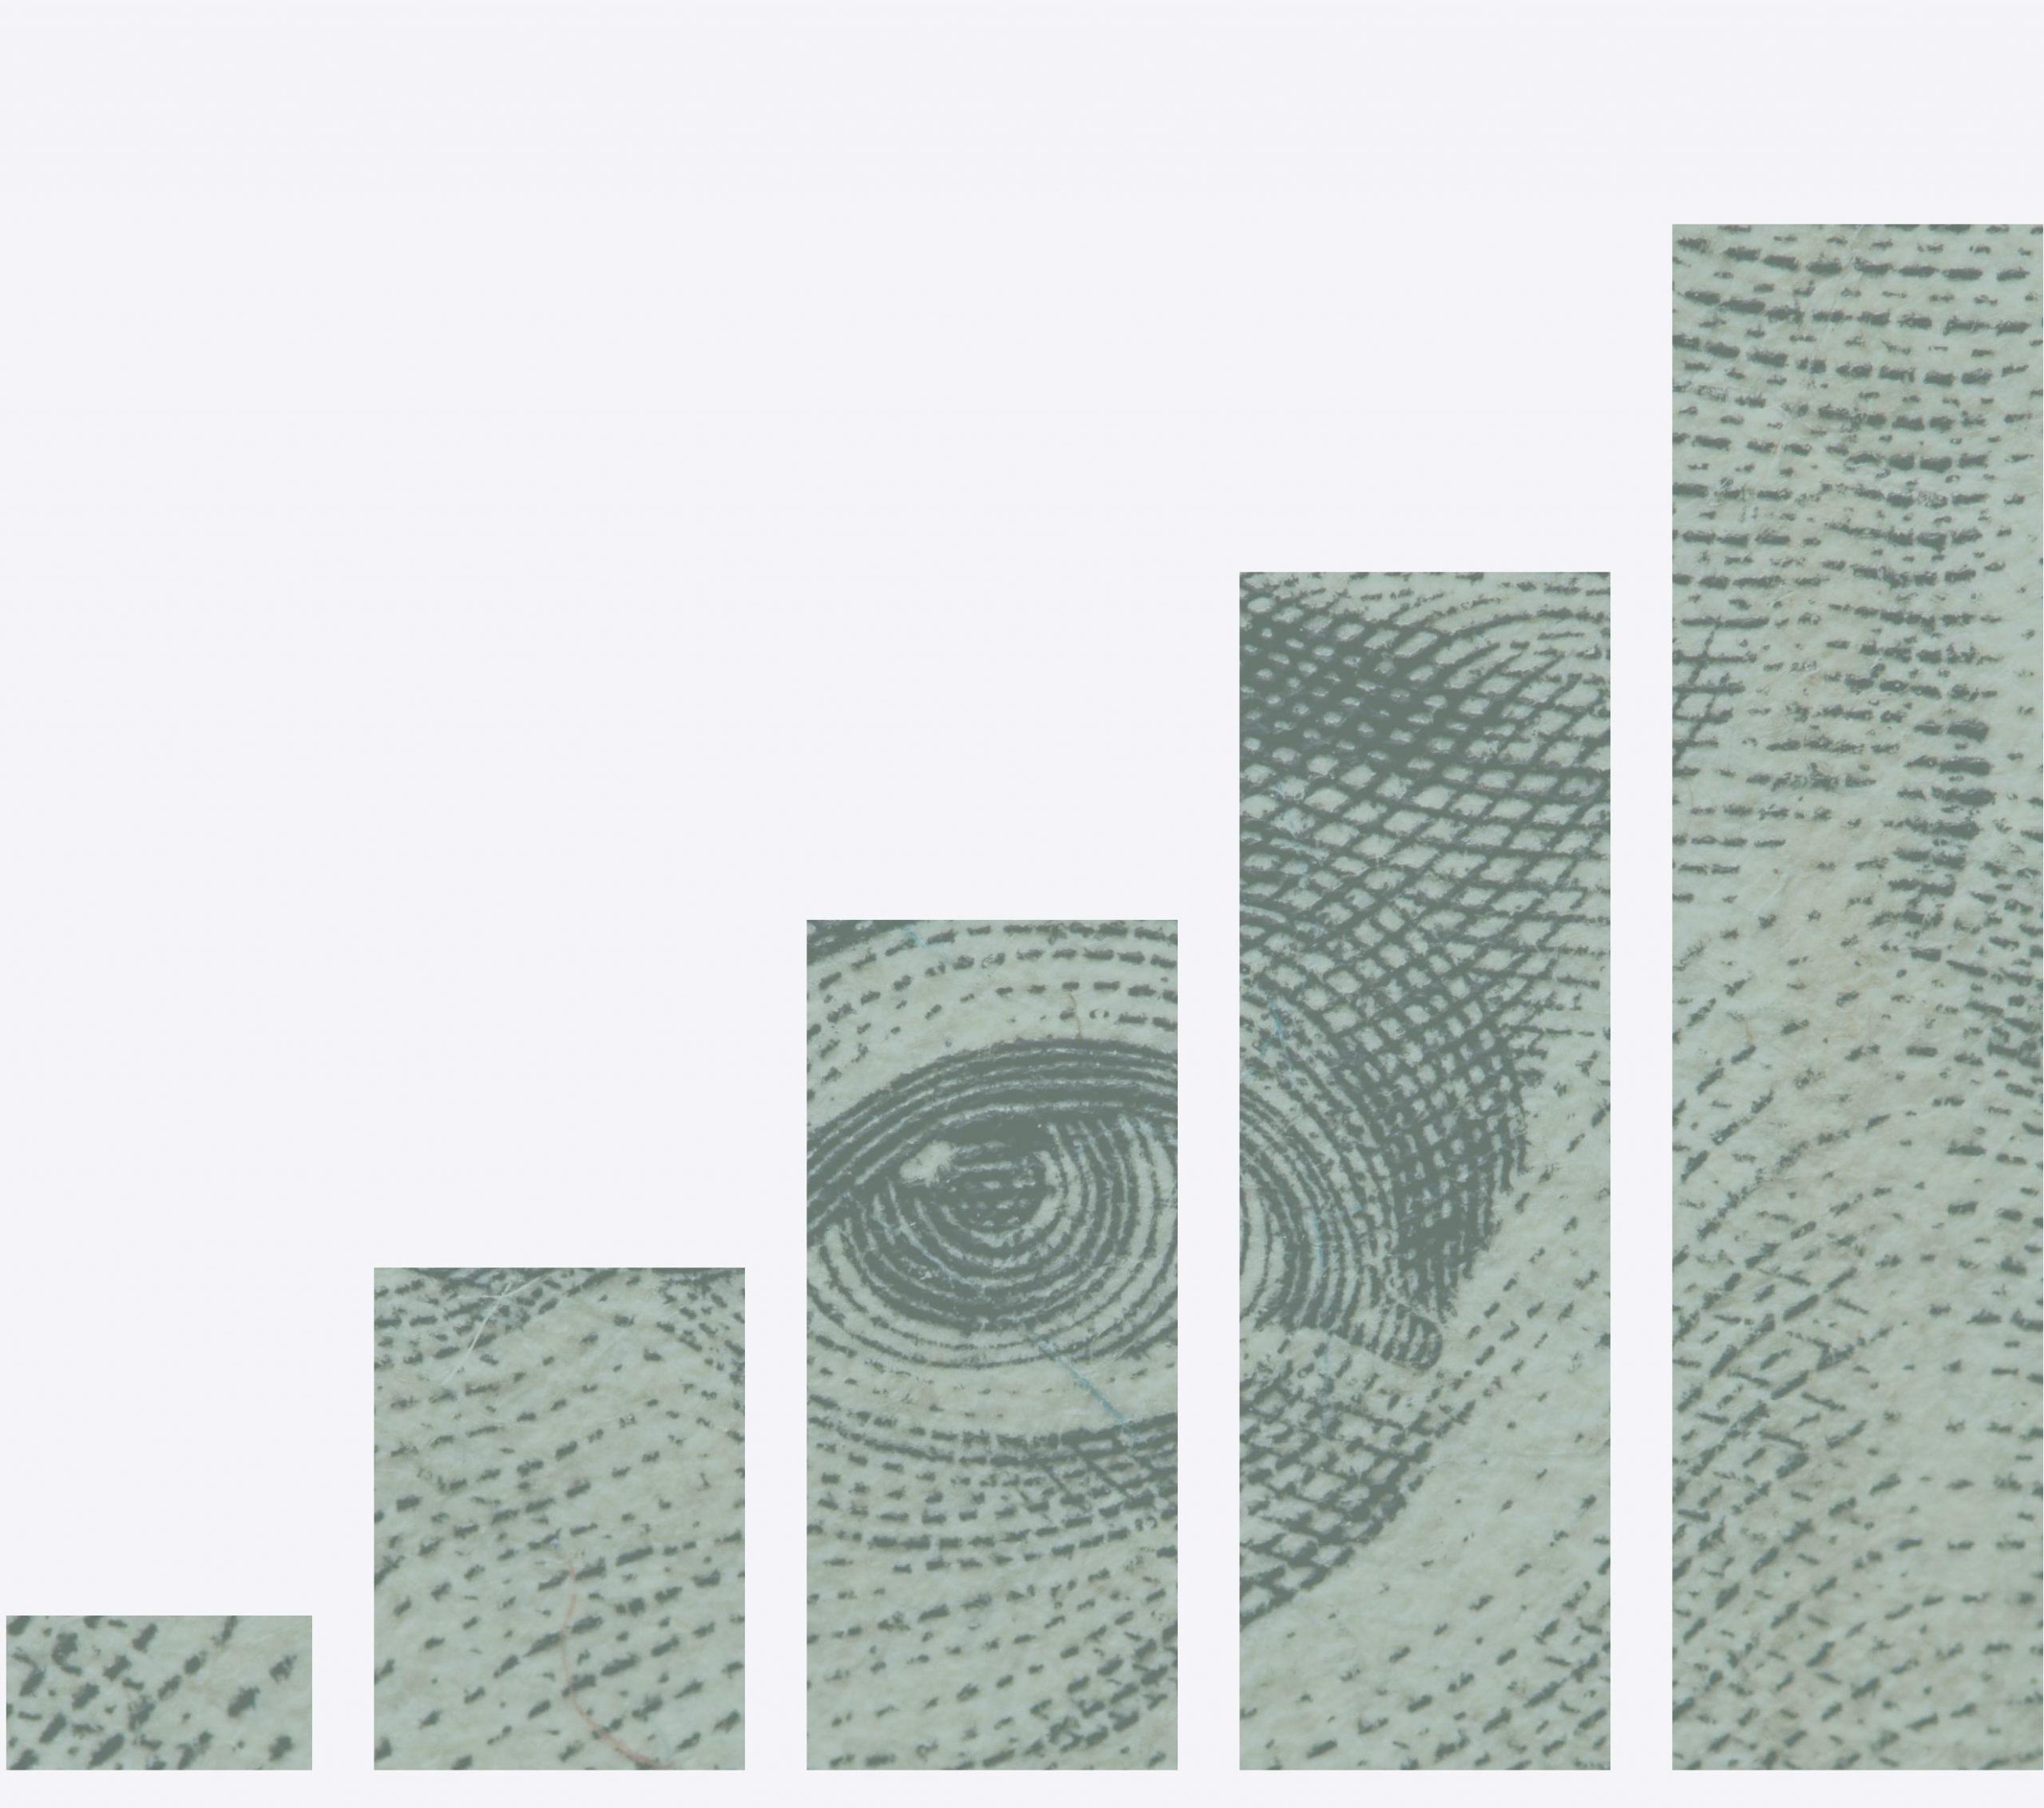 increasing bar graph with a dollar bill peeking through